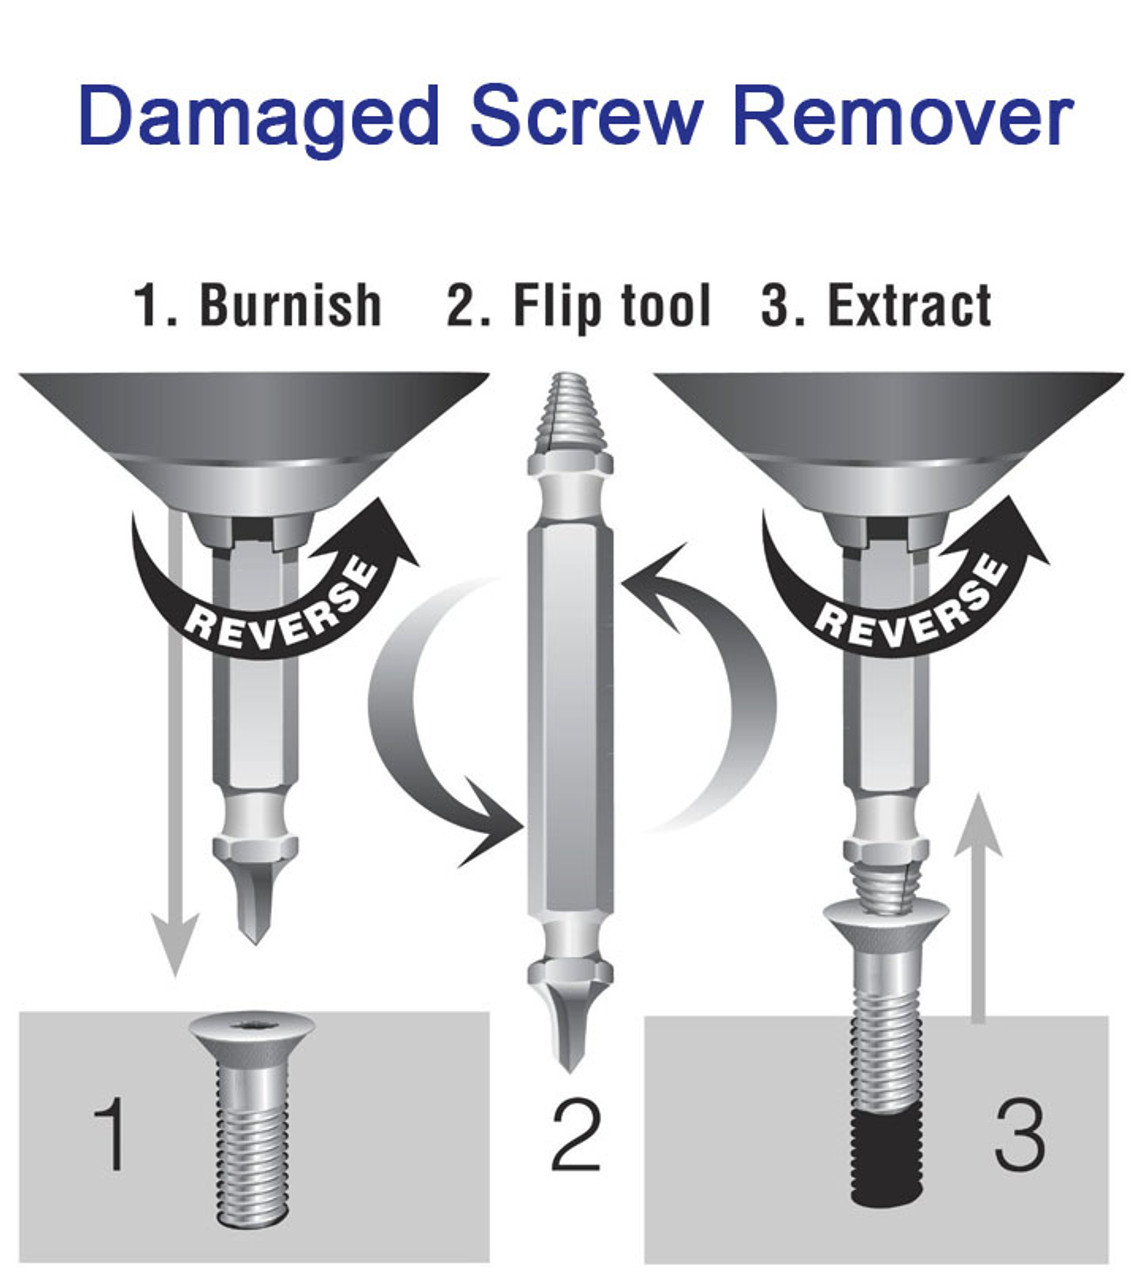 Damaged Screw Remover - 3 Piece Kit